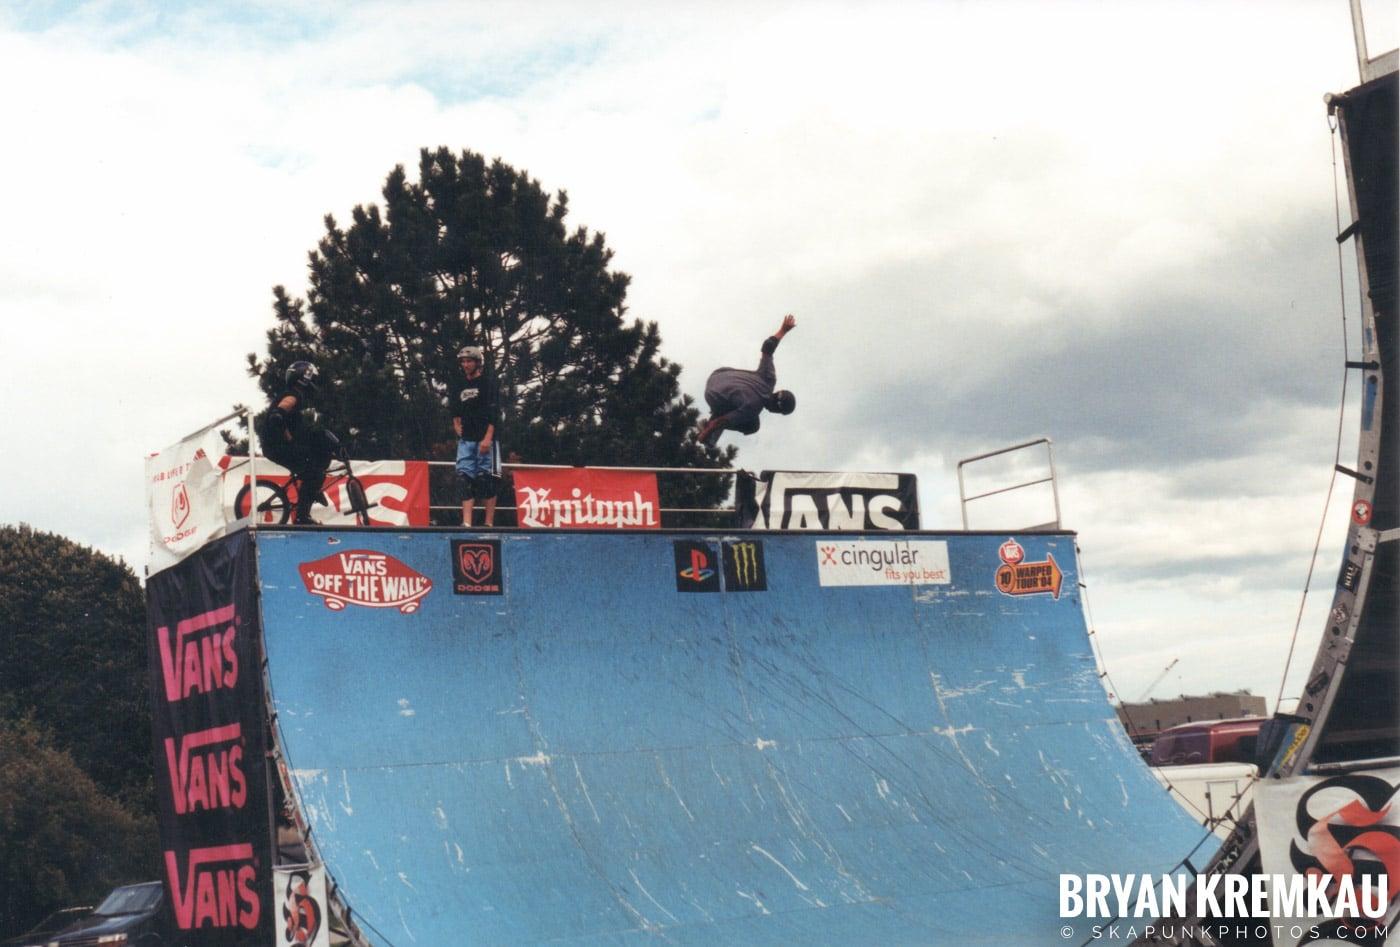 Skaters @ Vans Warped Tour, Randall's Island, NYC - 8.7.04 (8)